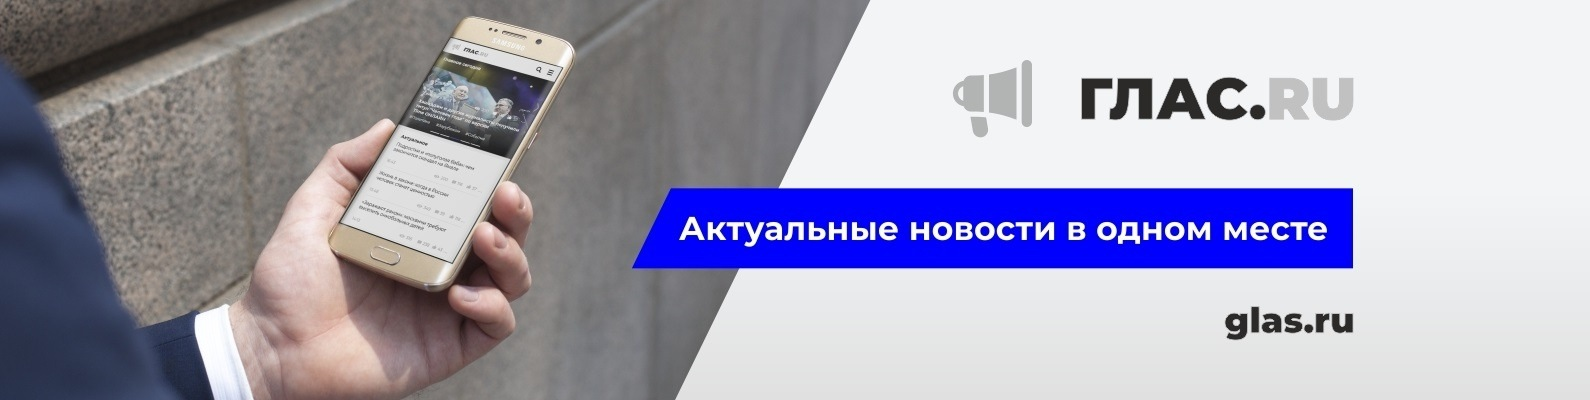 ГЛАС.RU | Новости | ВКонтакте